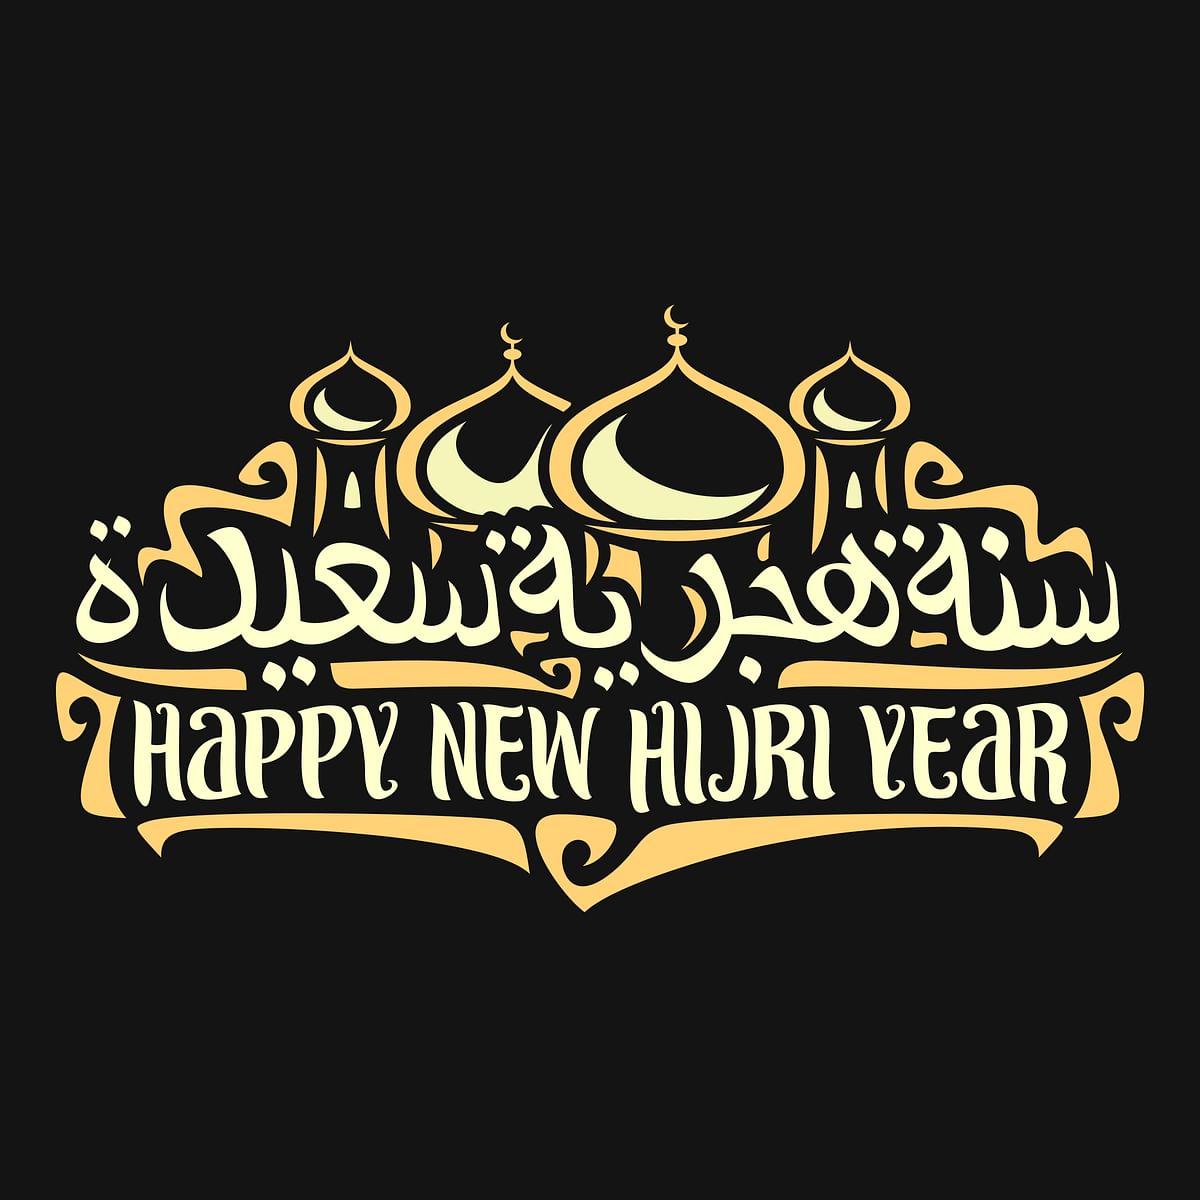 Hijri Islamic New Year 1441 Greeting In Arabic Urdu English Hindi Happy Hijri Newyear 1440 Wishes Quotes Sms Whatsapp Status Instagram Images Facebook Sticker